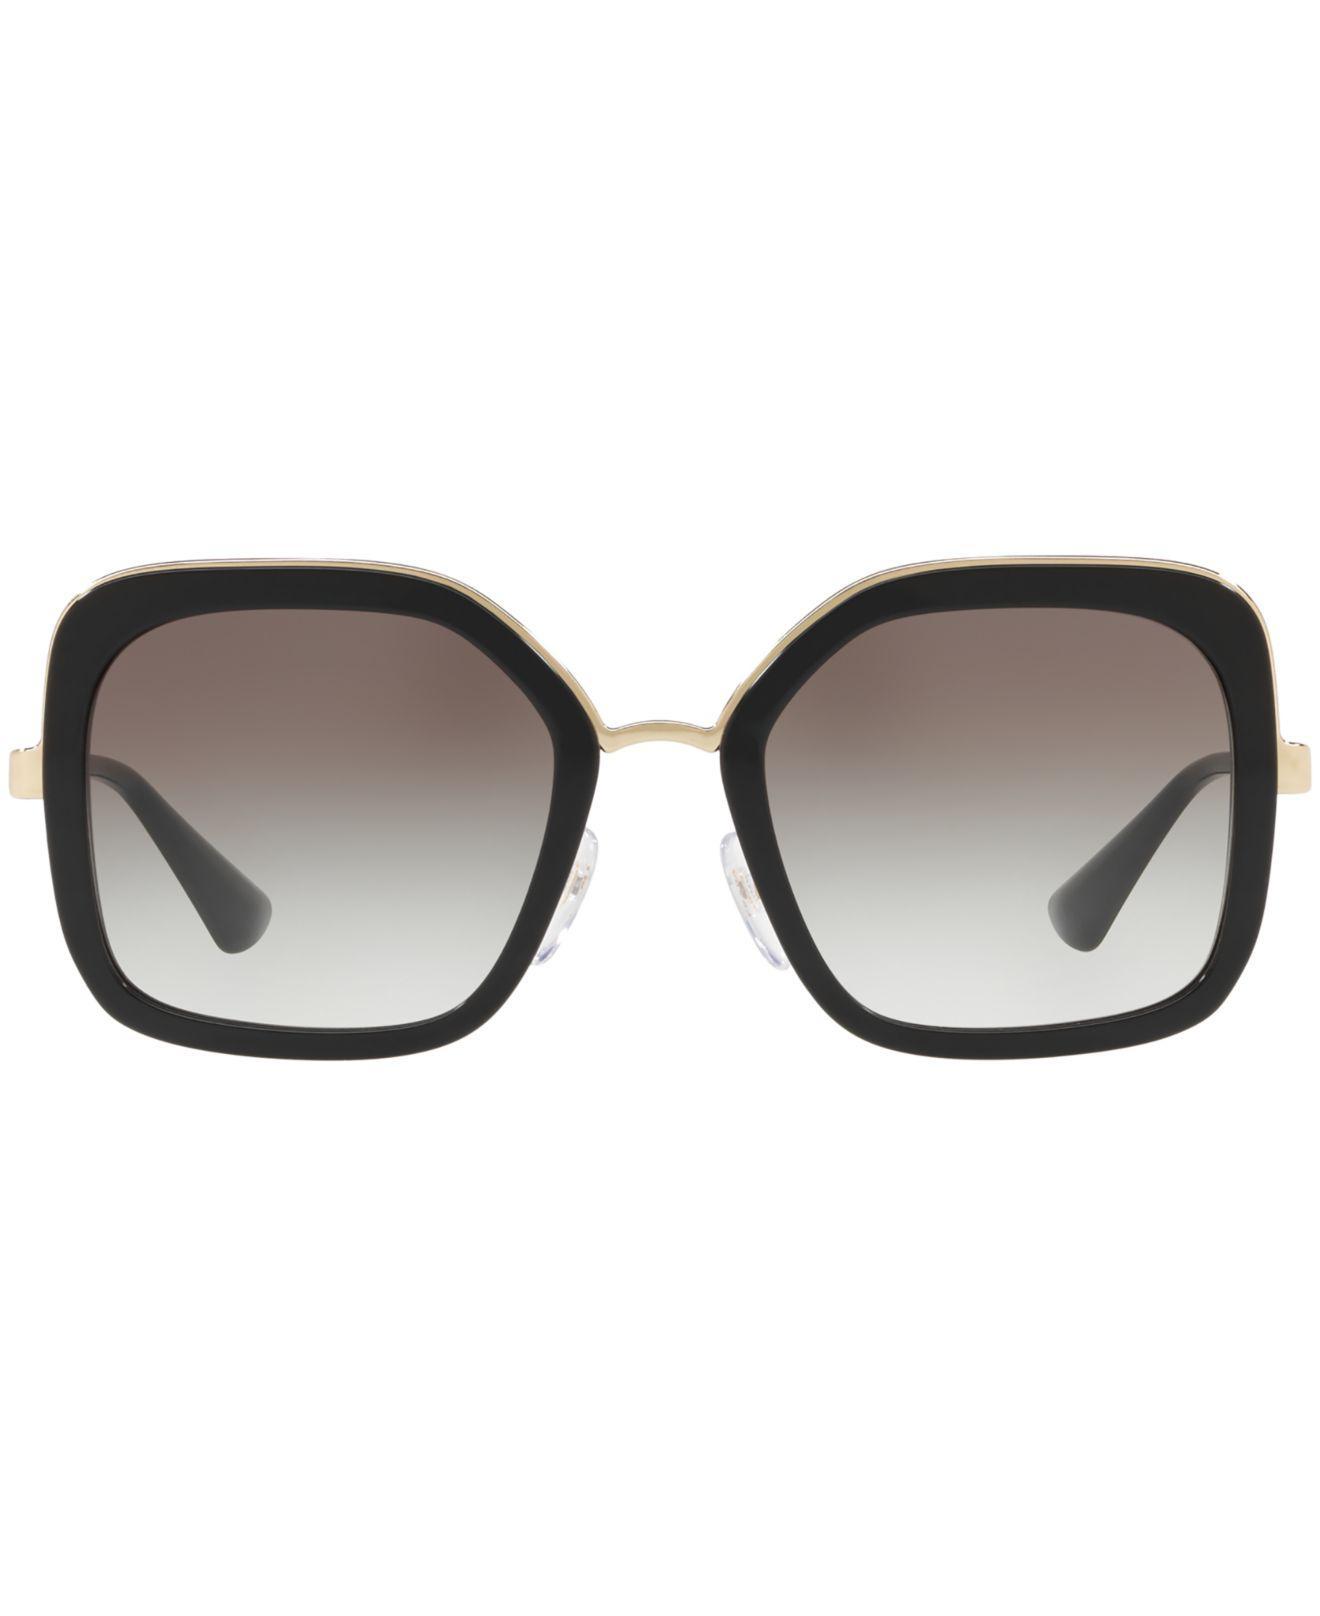 9eaf1048ef9f ... order lyst prada sunglasses pr 57us in black 882d5 a7507